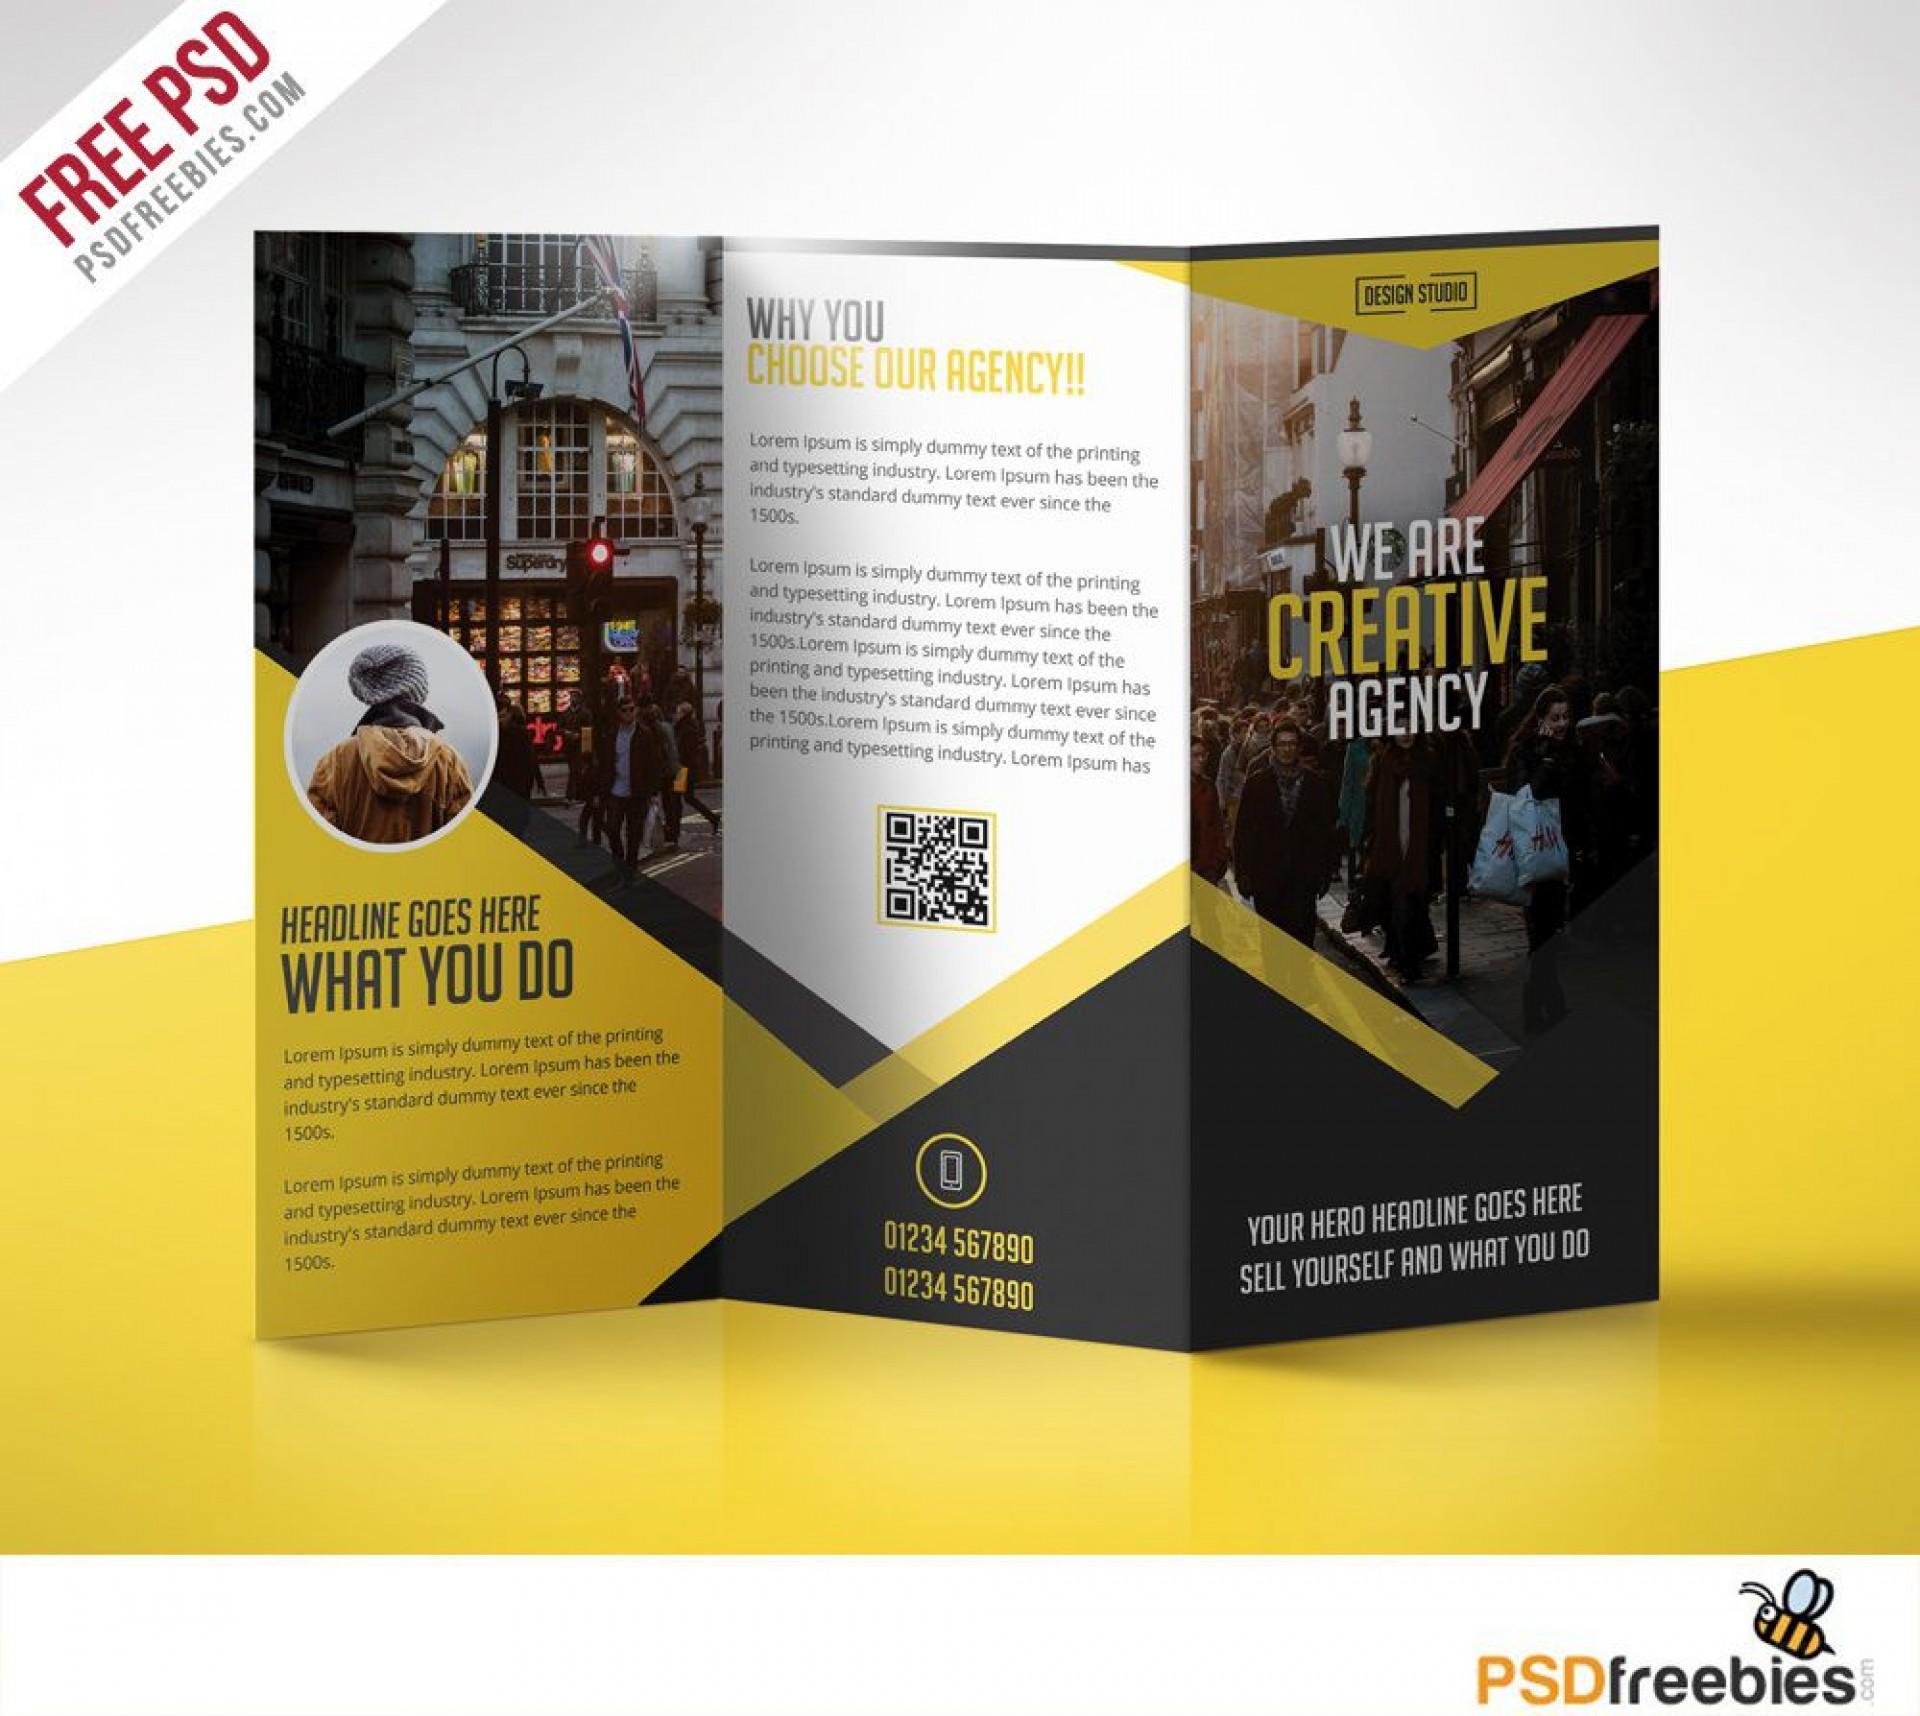 008 Surprising Brochure Design Template Psd Free Download Photo  Hotel1920